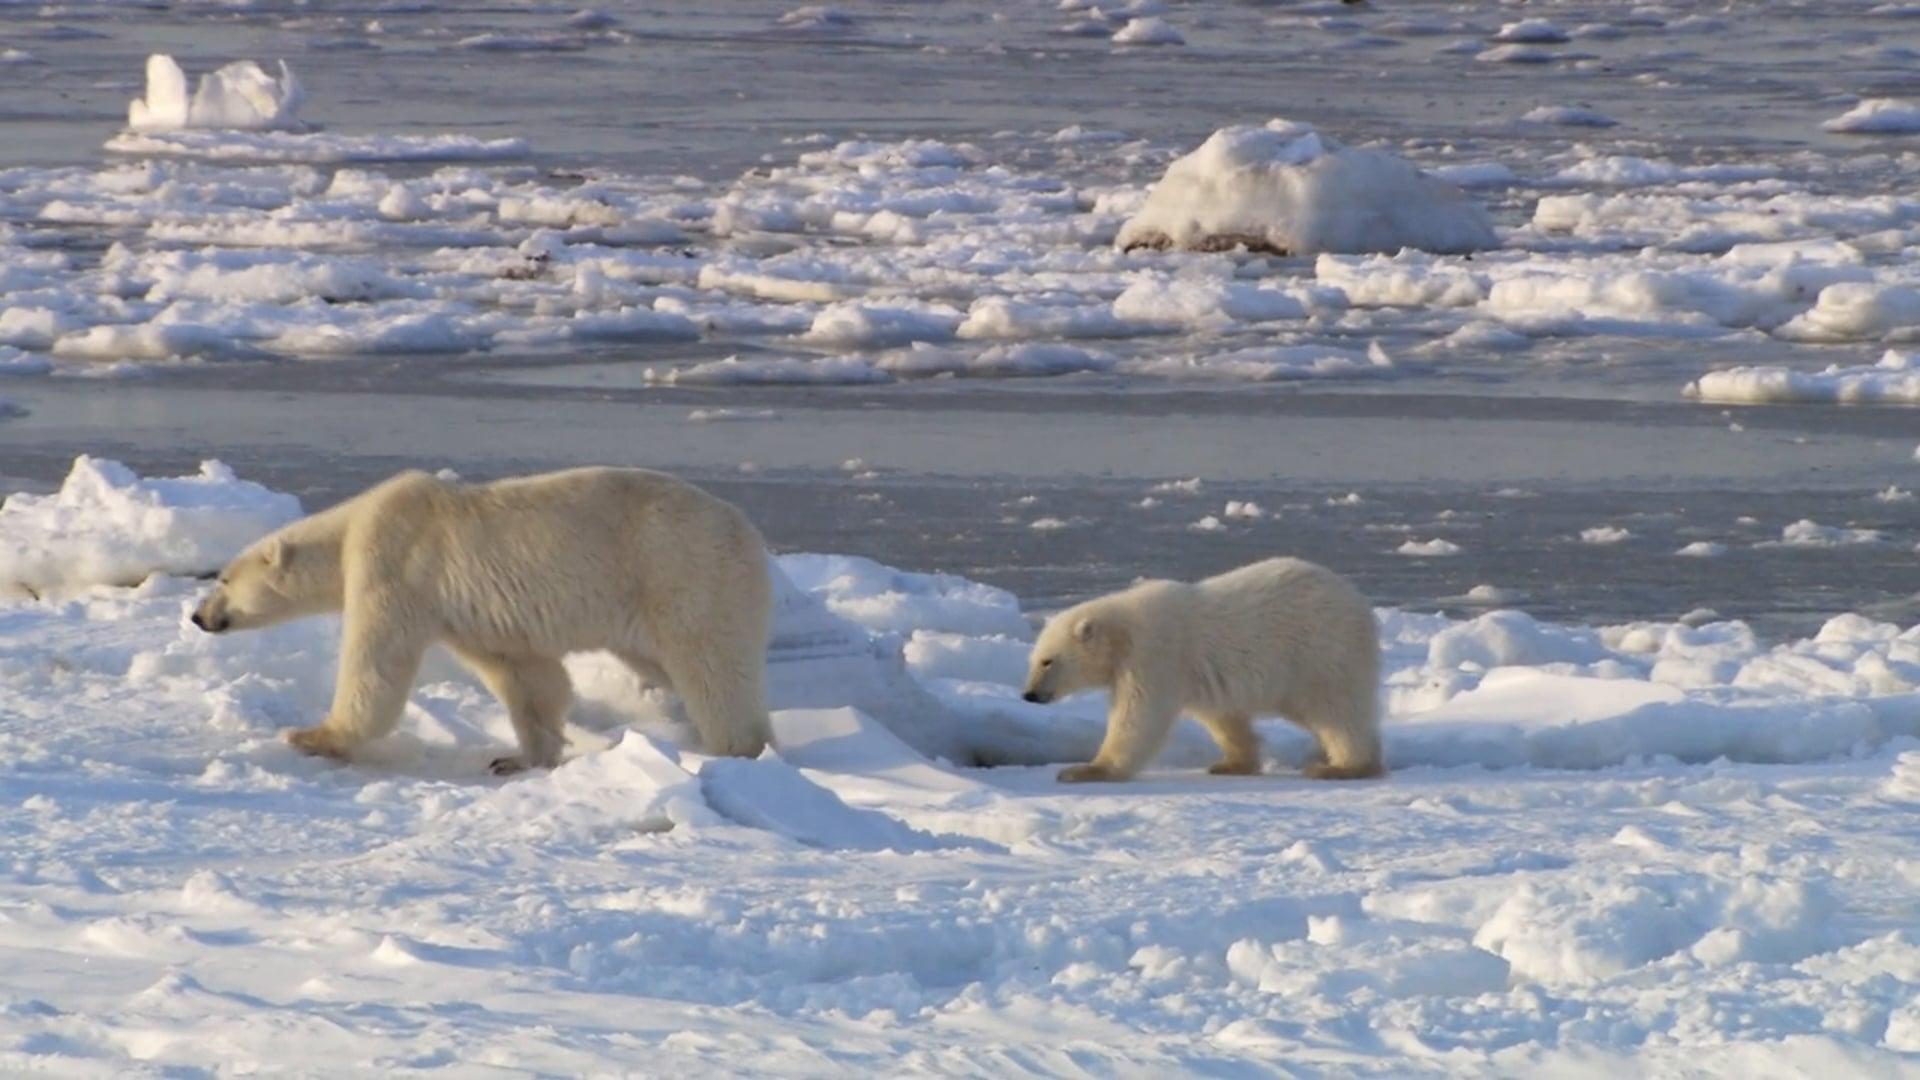 Ice Bear Trailer